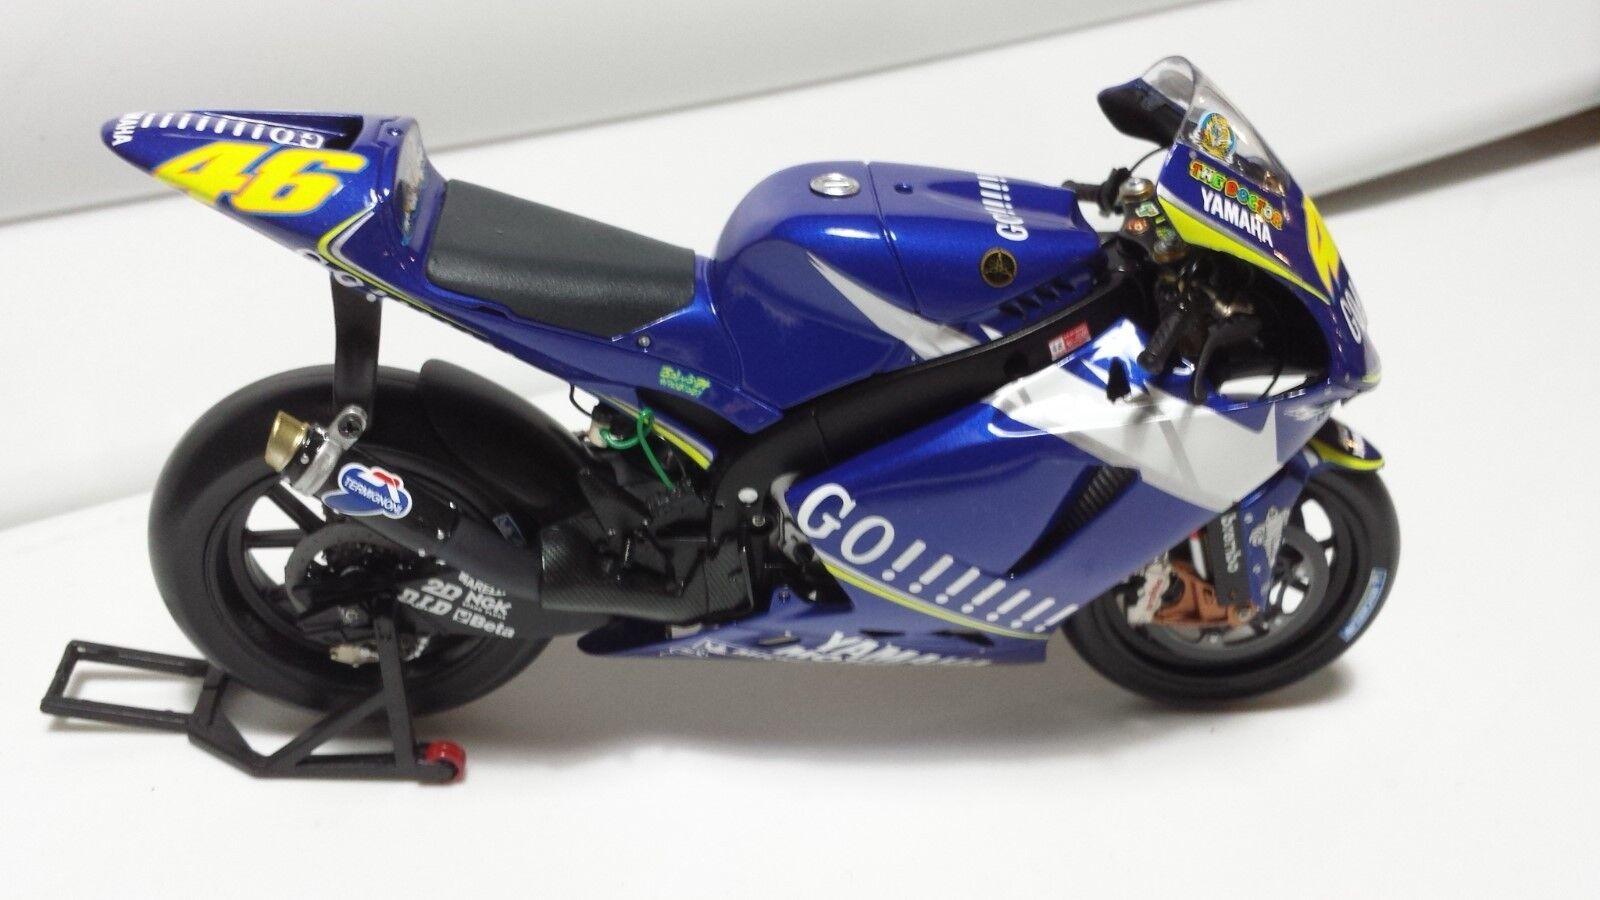 Valentino Rossi. Yamaha YZR-M1. MotoGP 2005.  Minichamps 1 12.